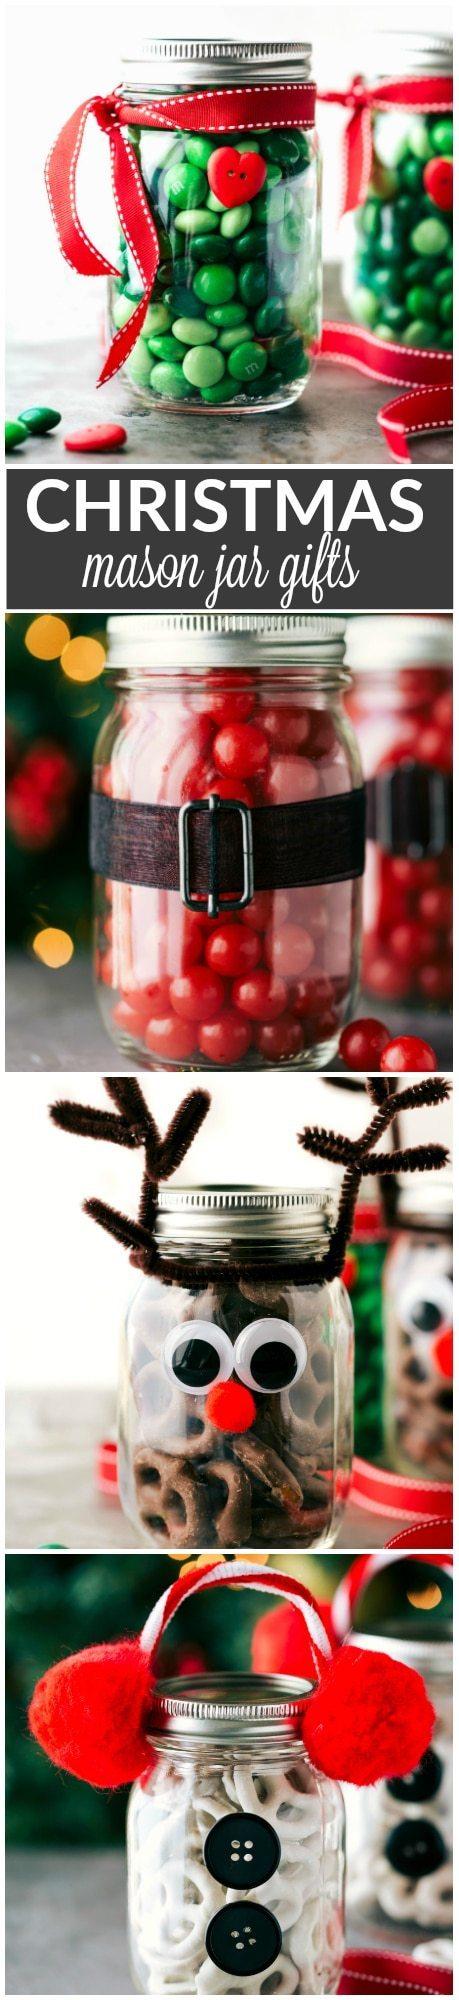 Christmas Mason Jar Gift Ideas | Chelsea's Messy Apron